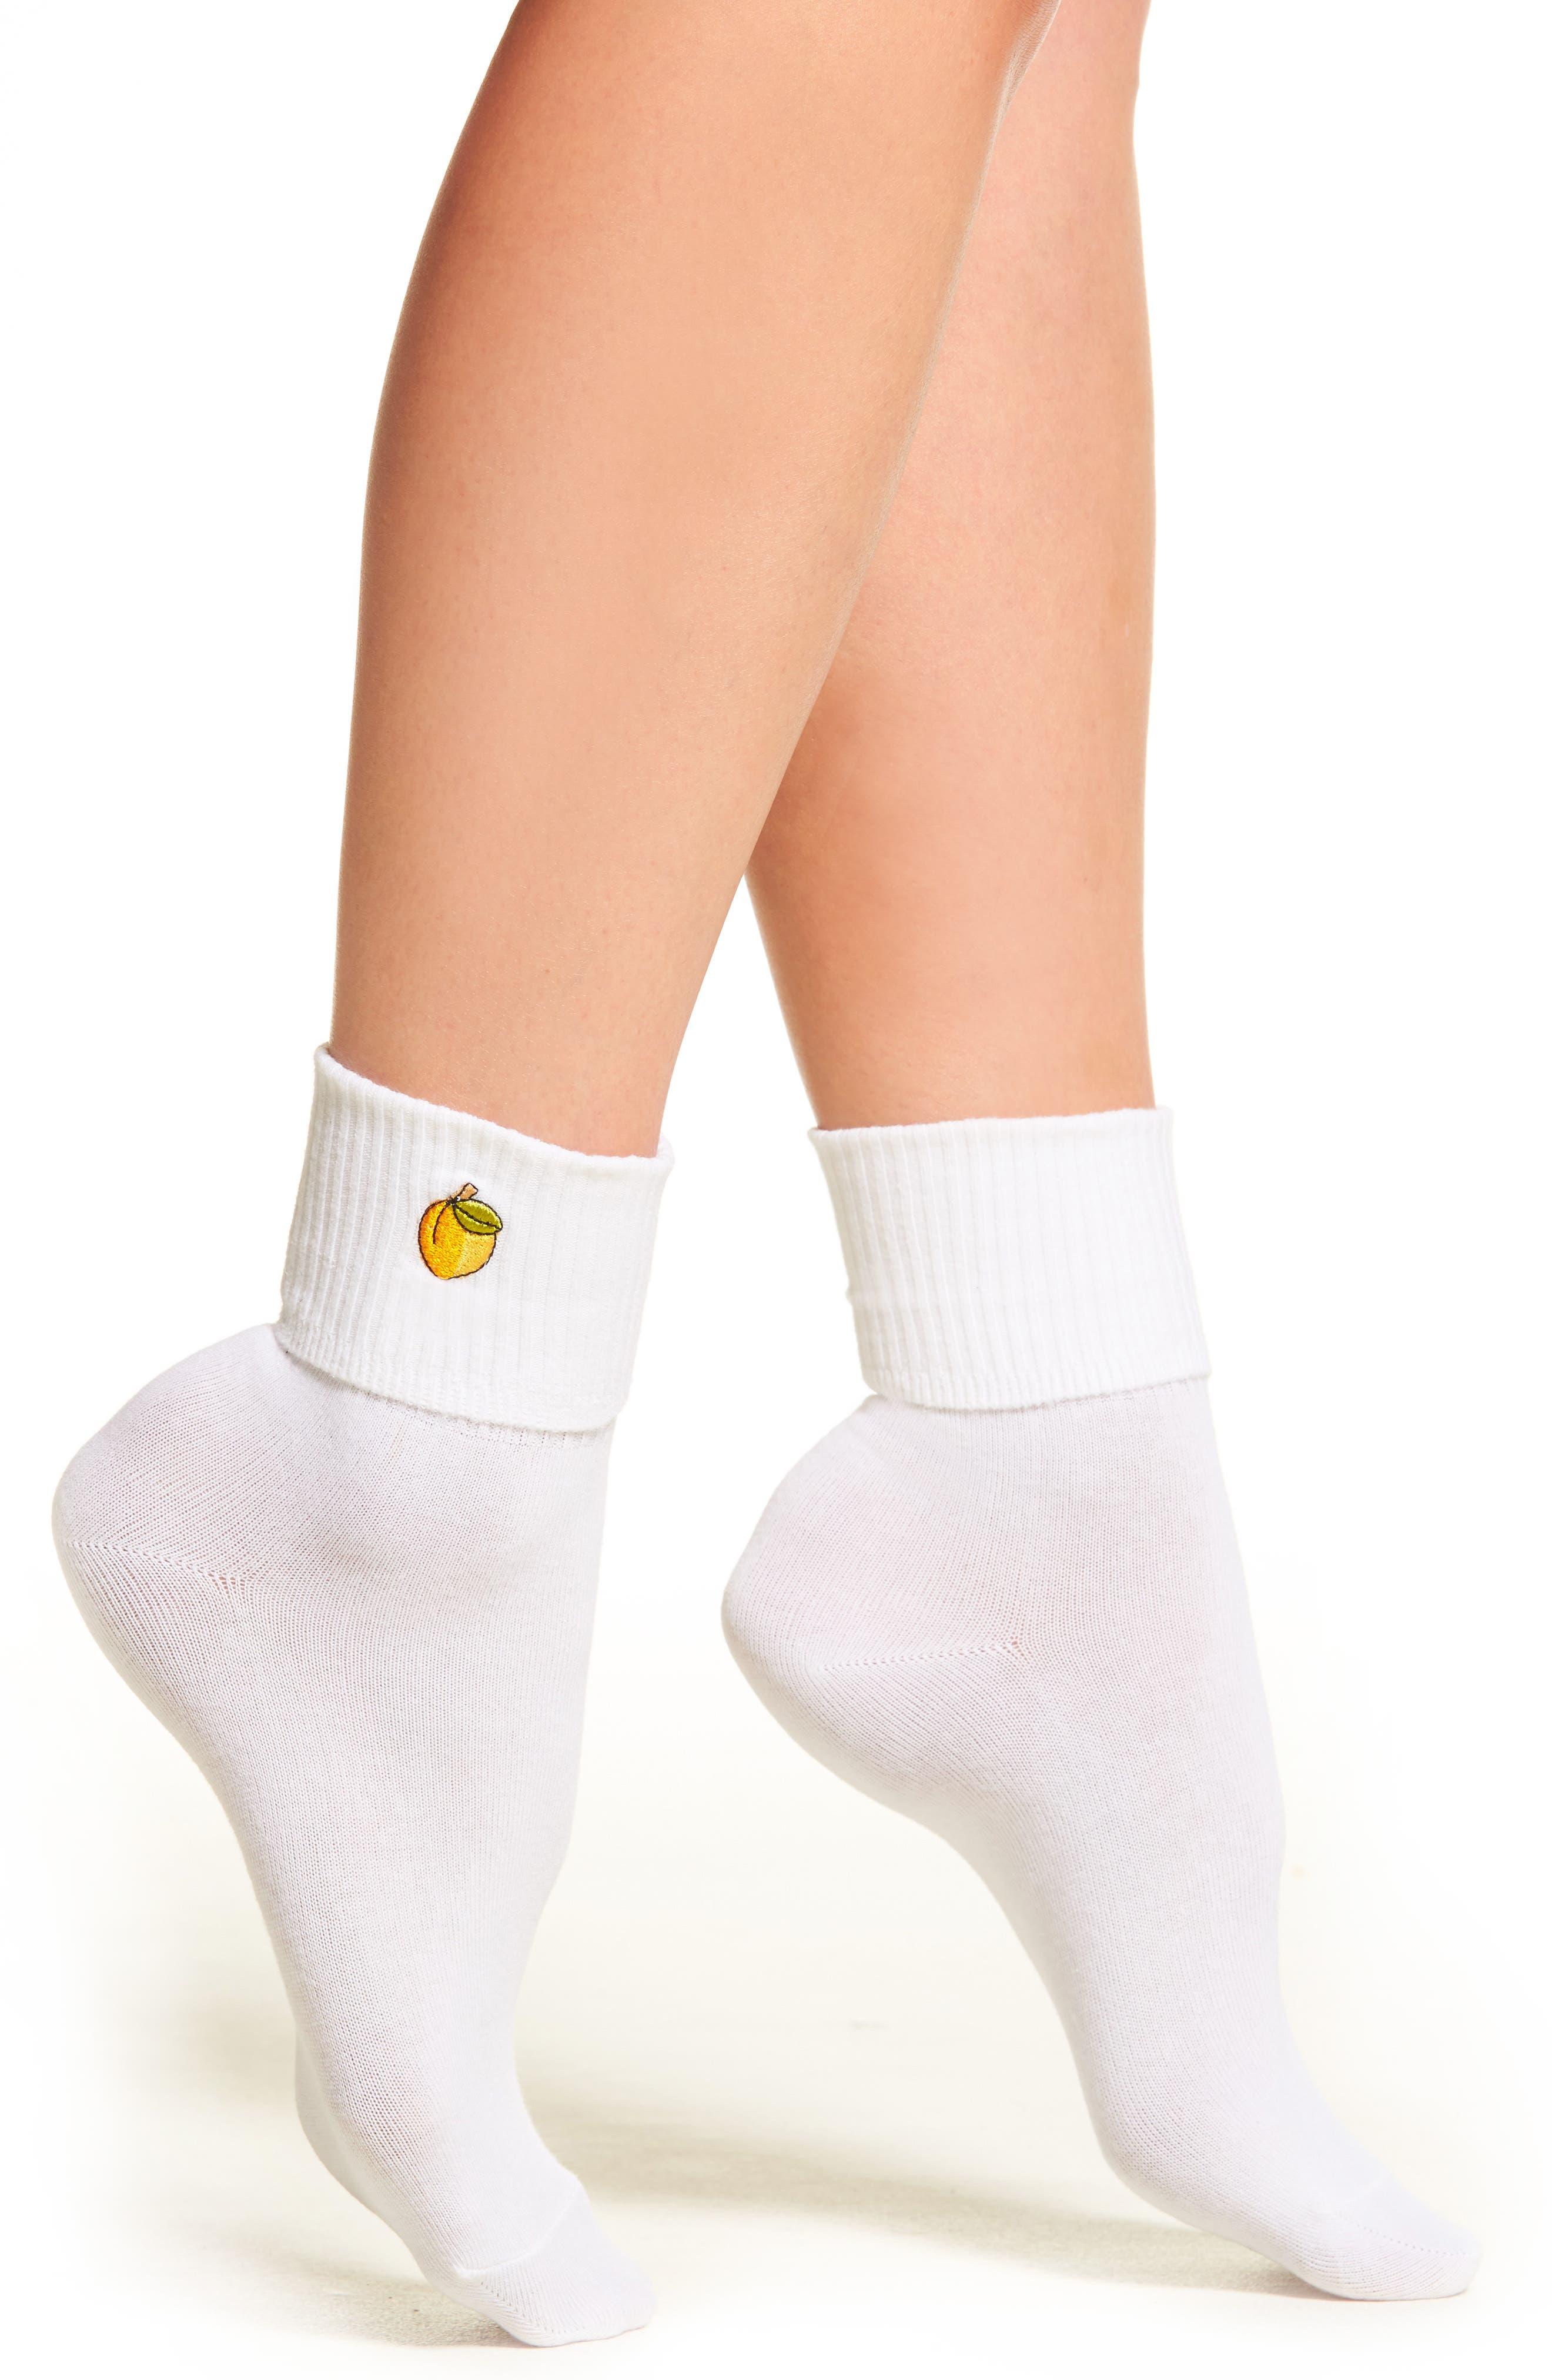 Yeah Bunny Peach Socks